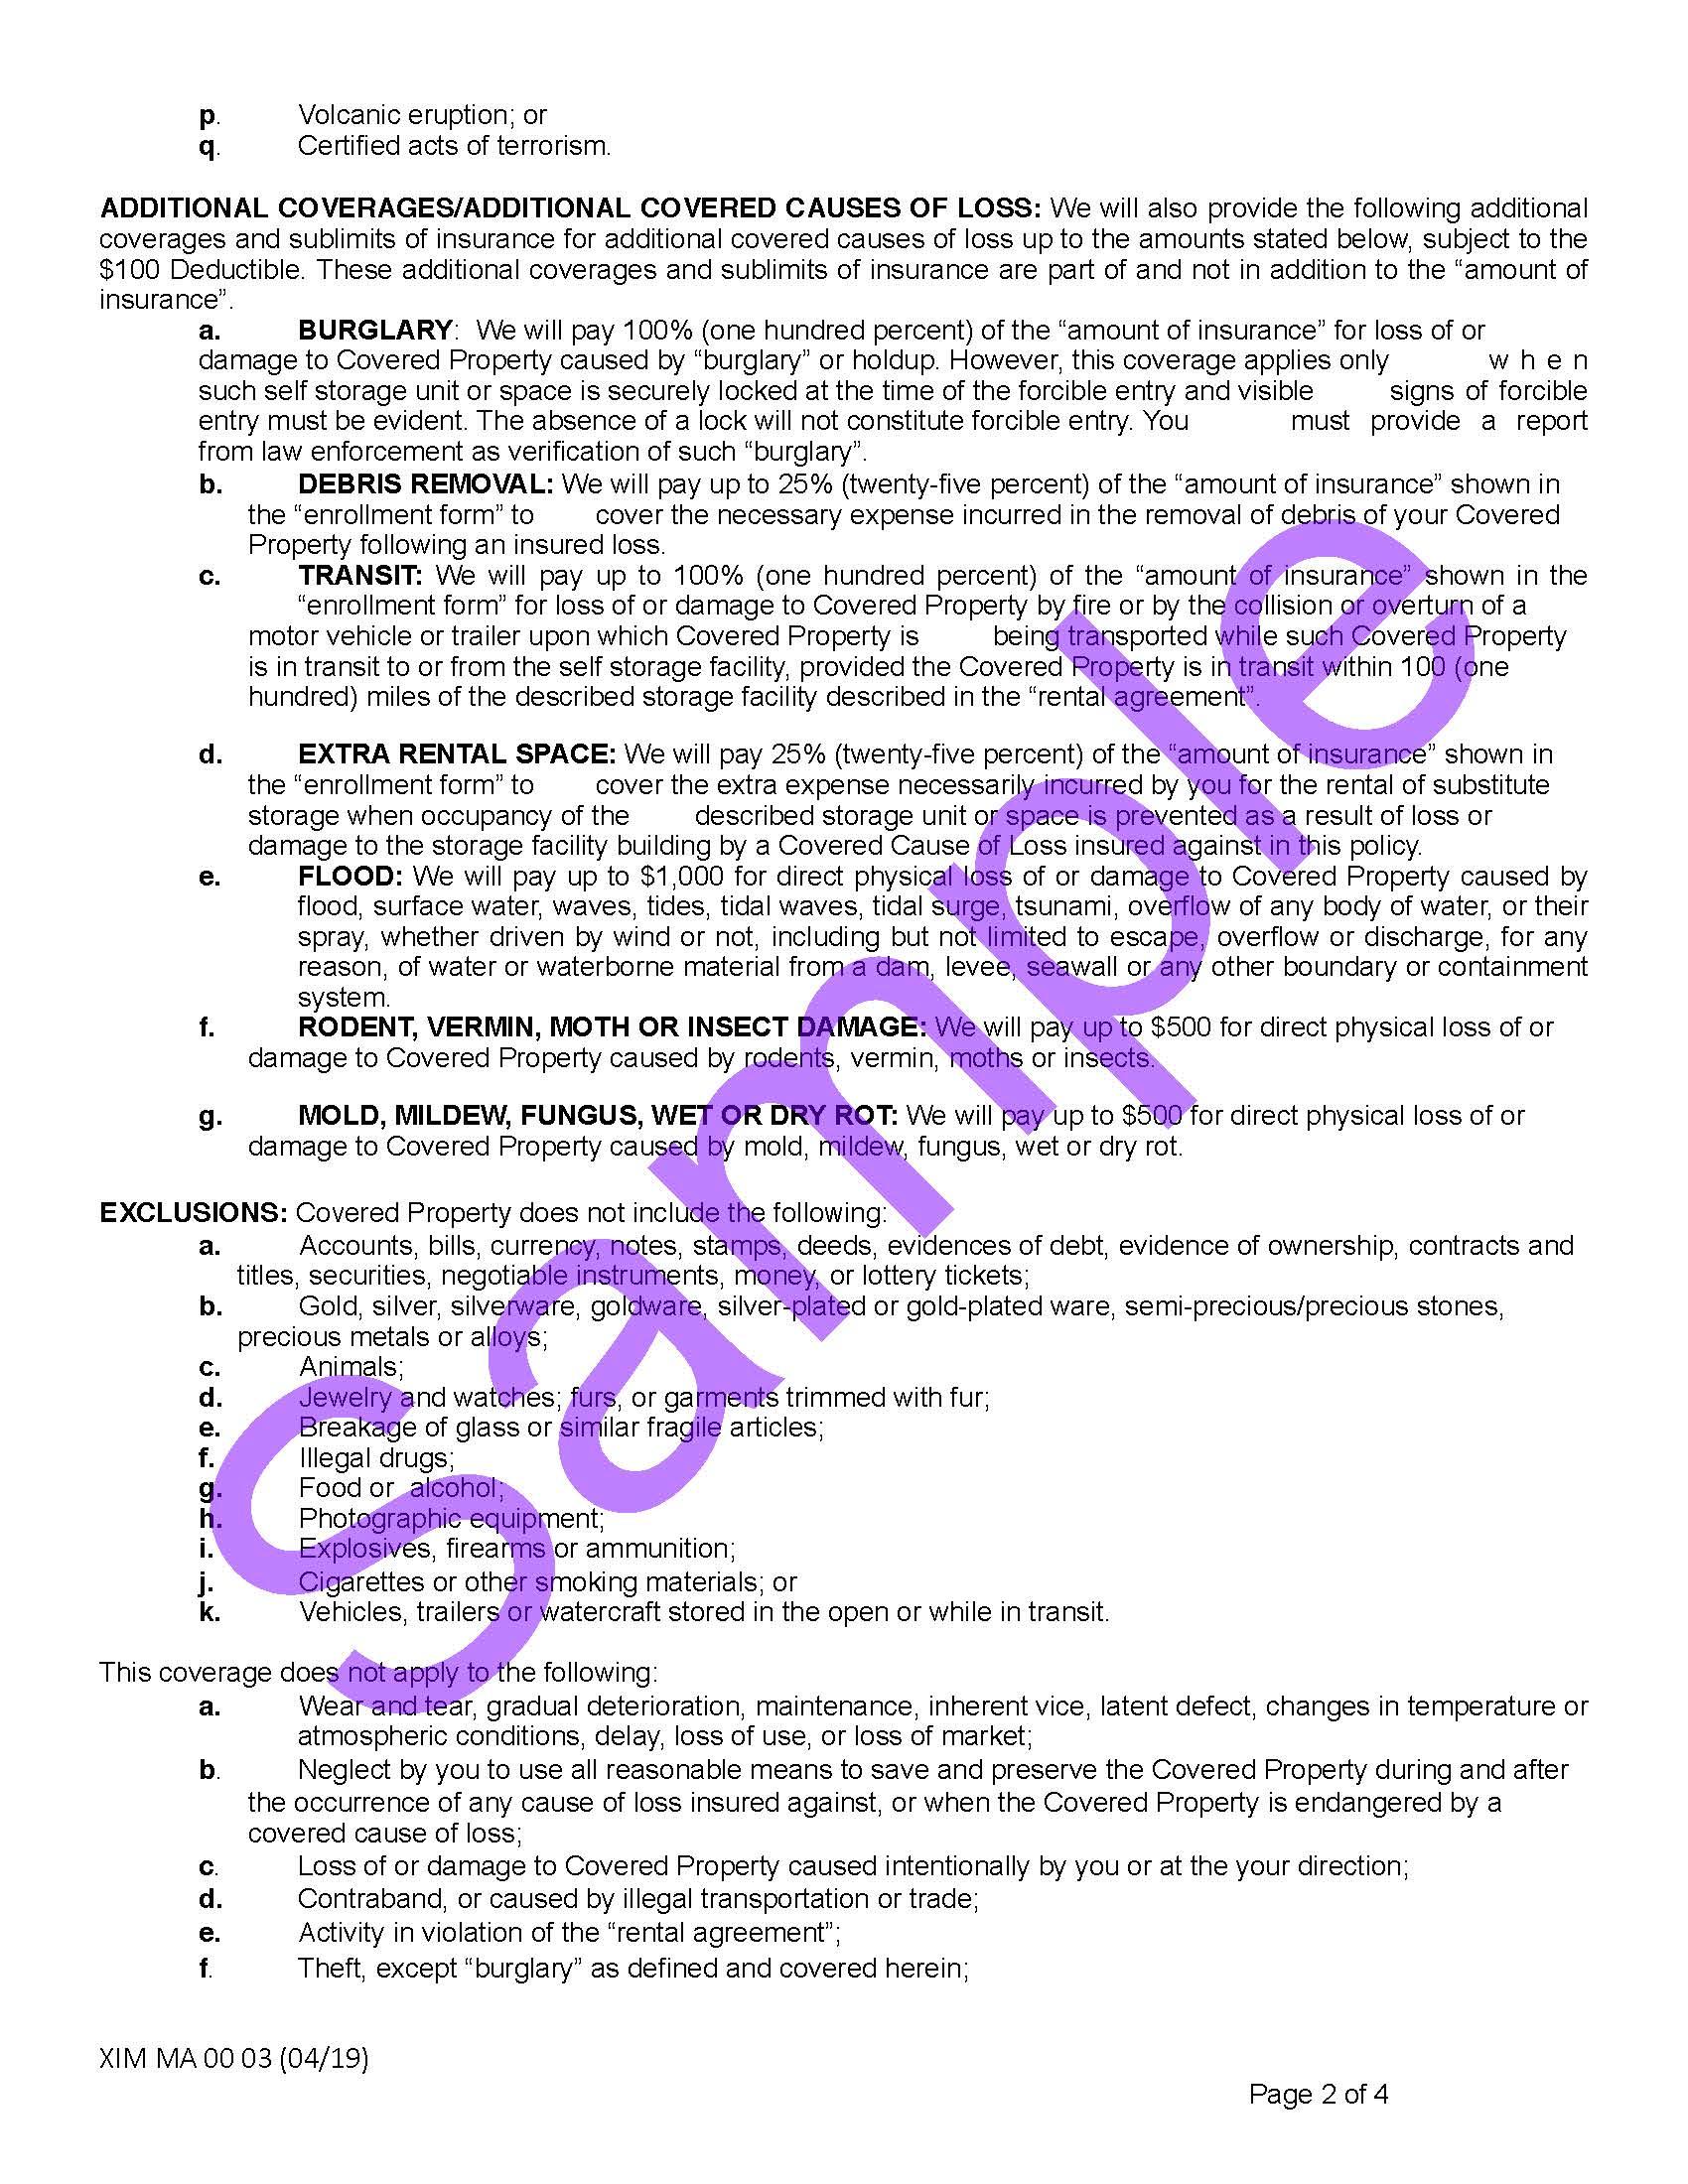 XIM MA 00 03 04 19 Massachusetts Certificate of Storage InsuranceSample_Page_2.jpg